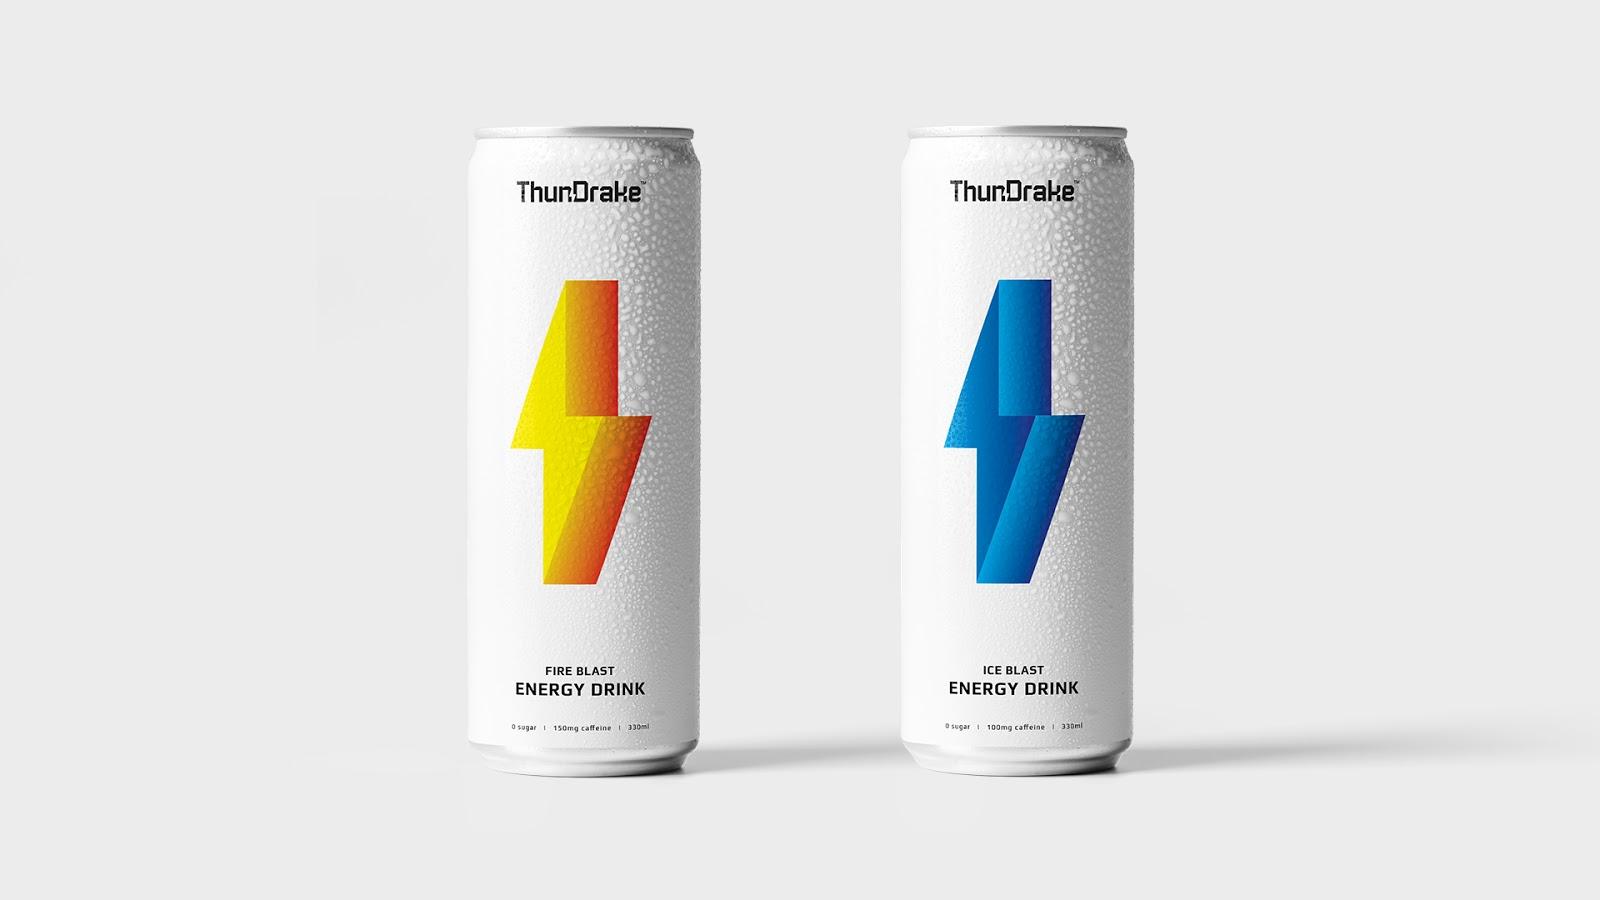 ThunDrake能量饮料概念包装设计